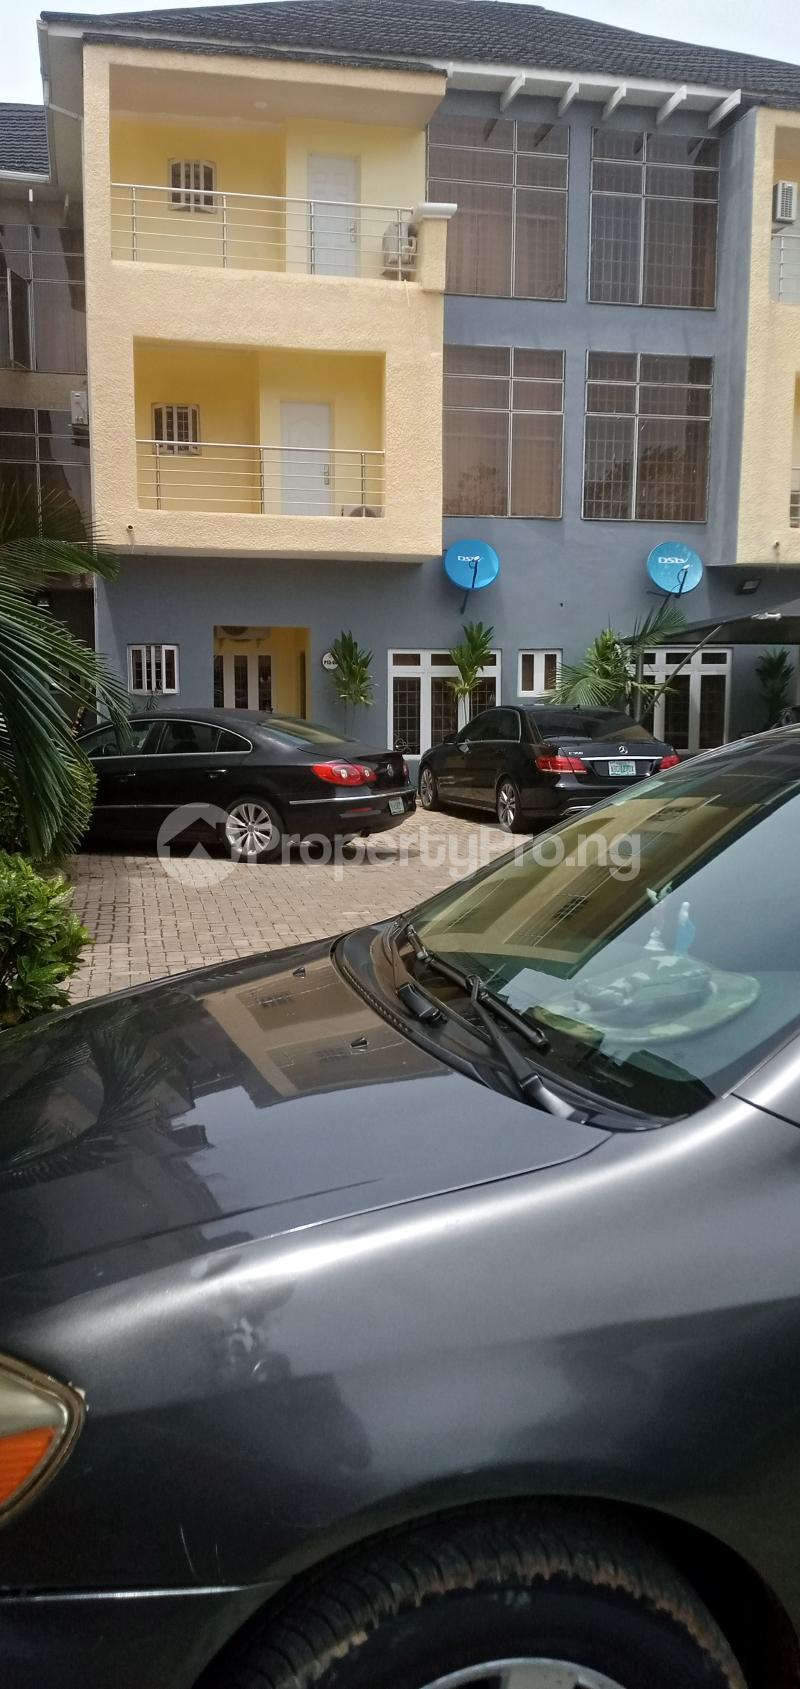 4 bedroom Terraced Duplex House for sale Close To Nnpc Guzape Guzape Abuja - 1